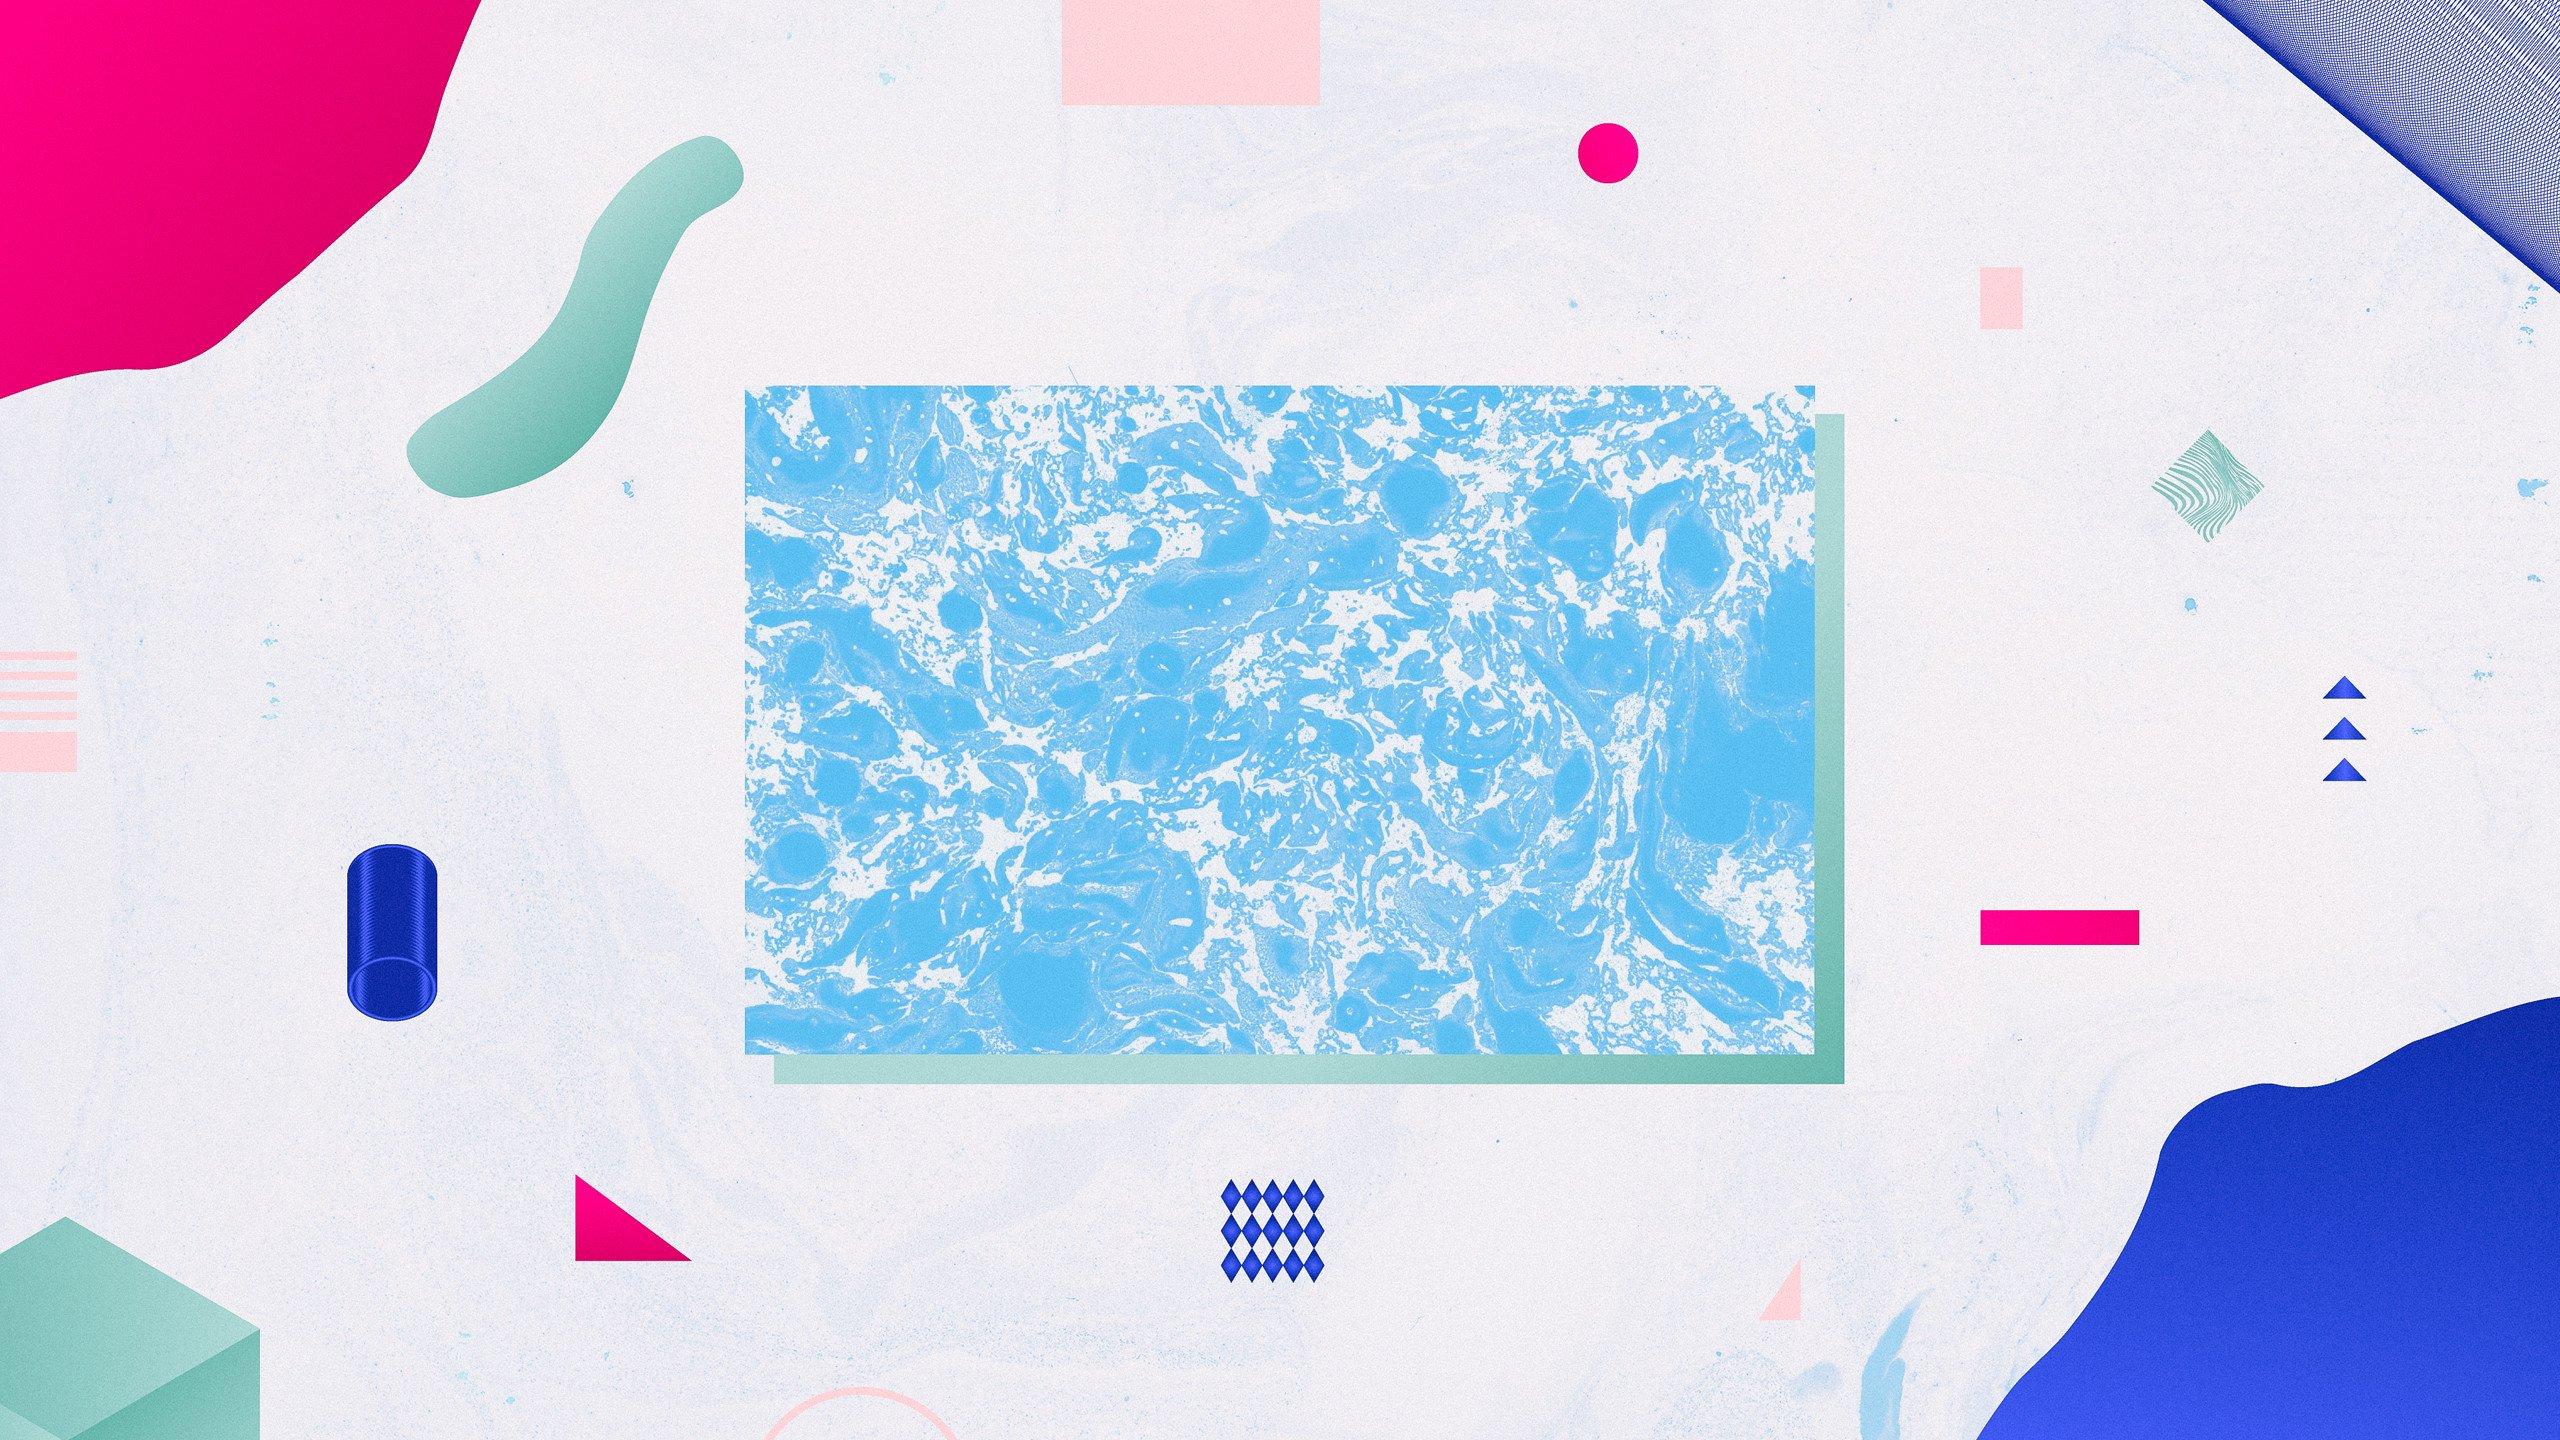 Desktop Aesthetic Wallpapers - Wallpaper Cave